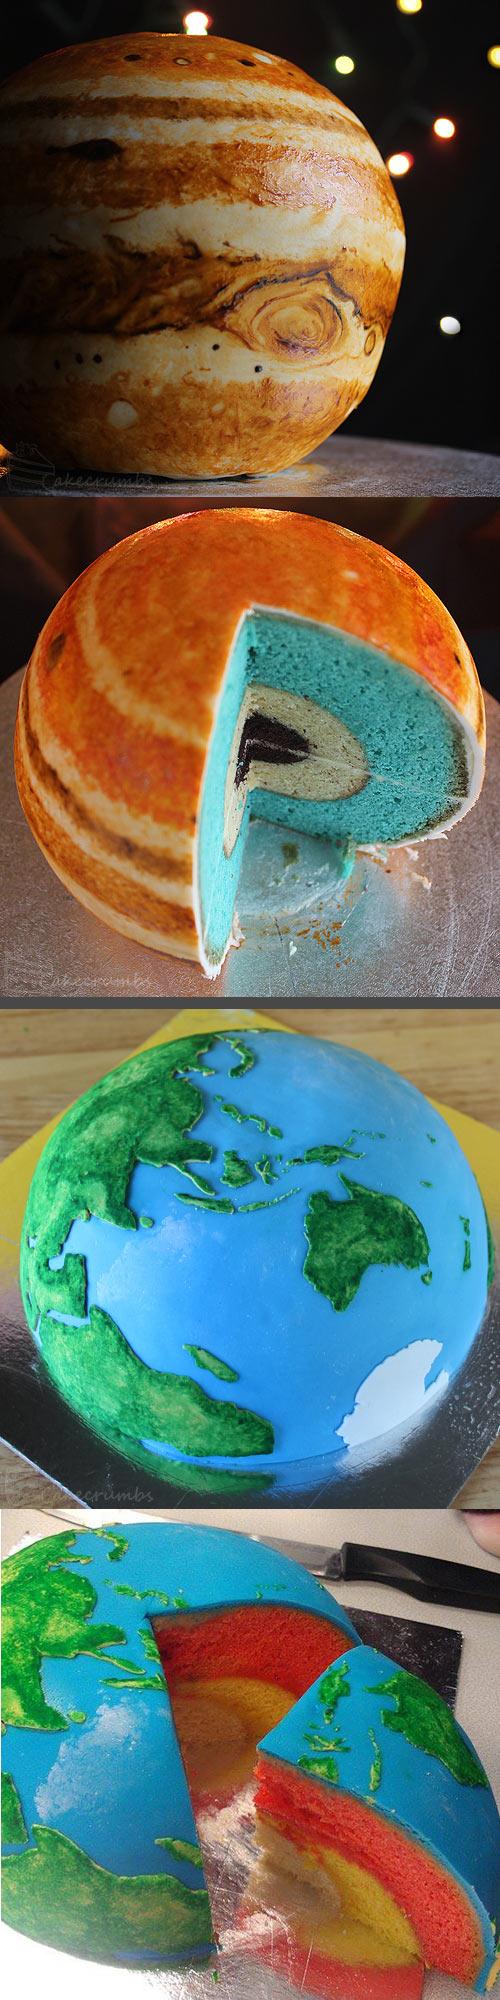 funny-planet-cake-shape-Earth